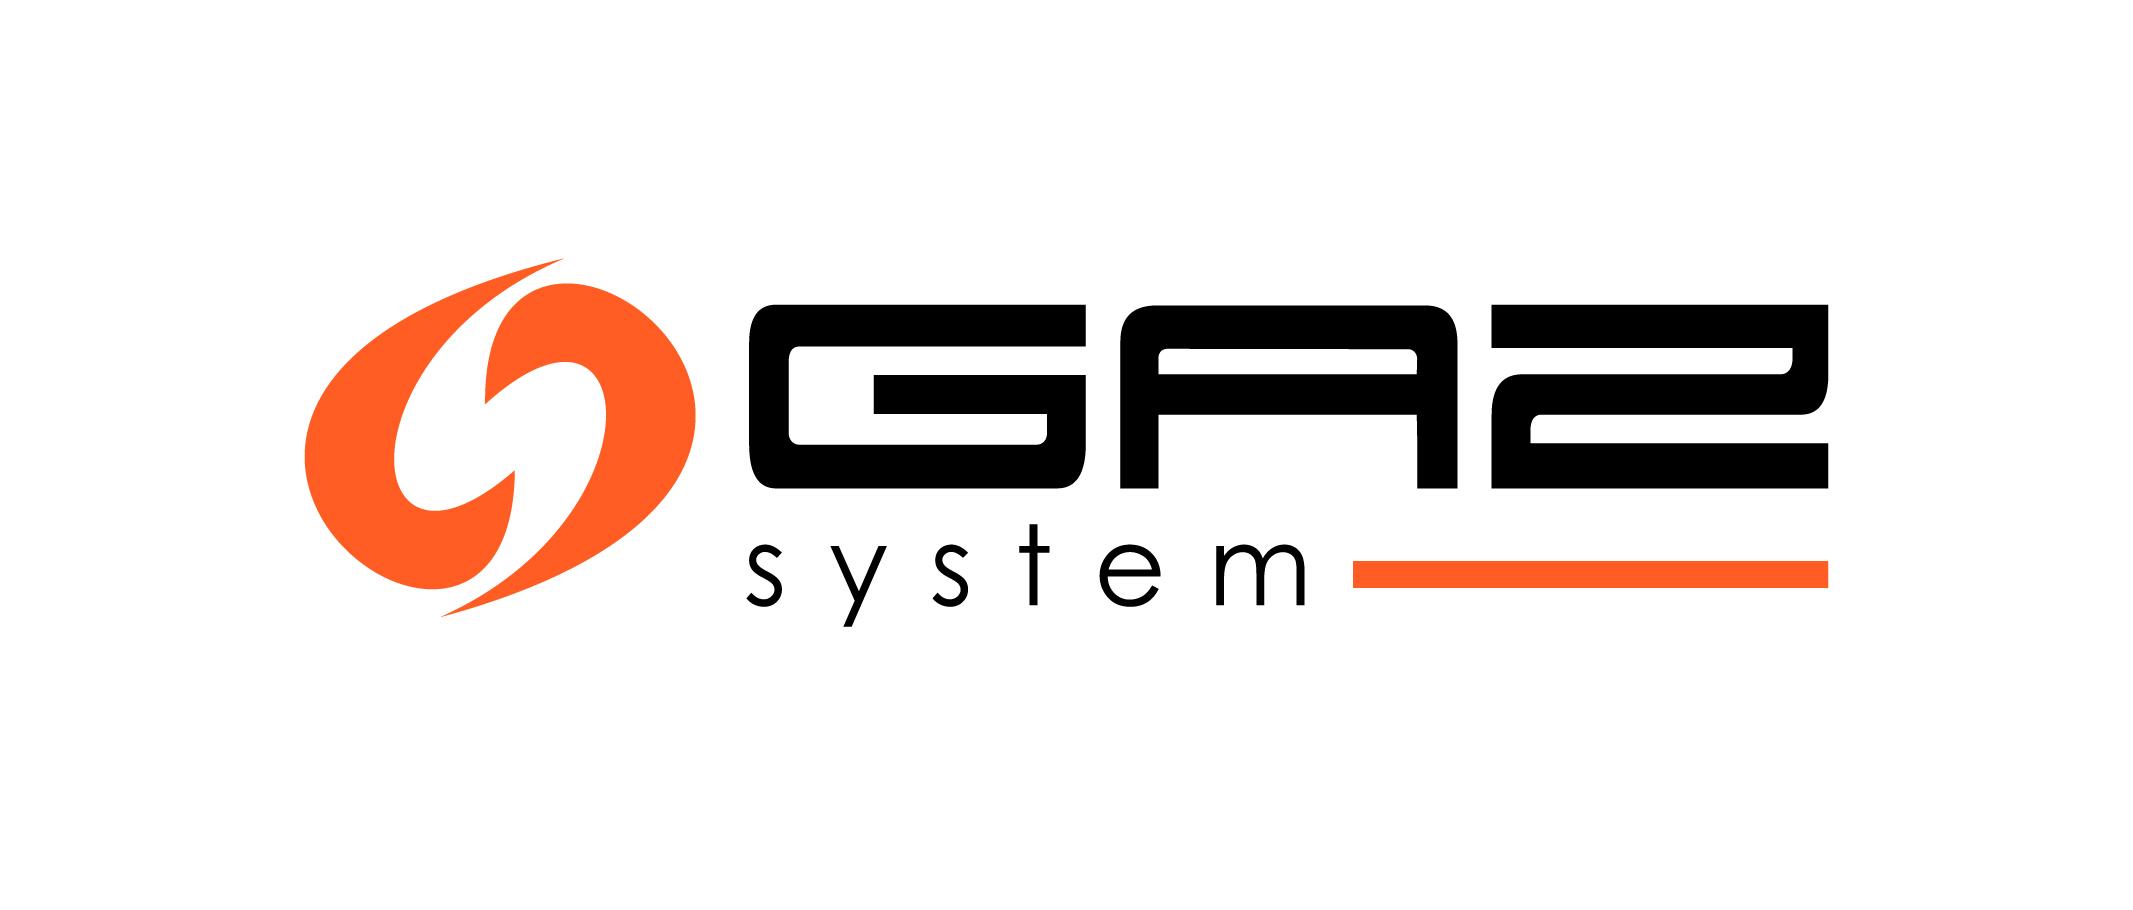 http://www.gaz-system.pl/fileadmin/centrum_prasowe/Logotypy/logo_z_polem_ochronnym/podstawowe/logotyp_rgb_z_polem_ochronnym_antyaliasing.jpg